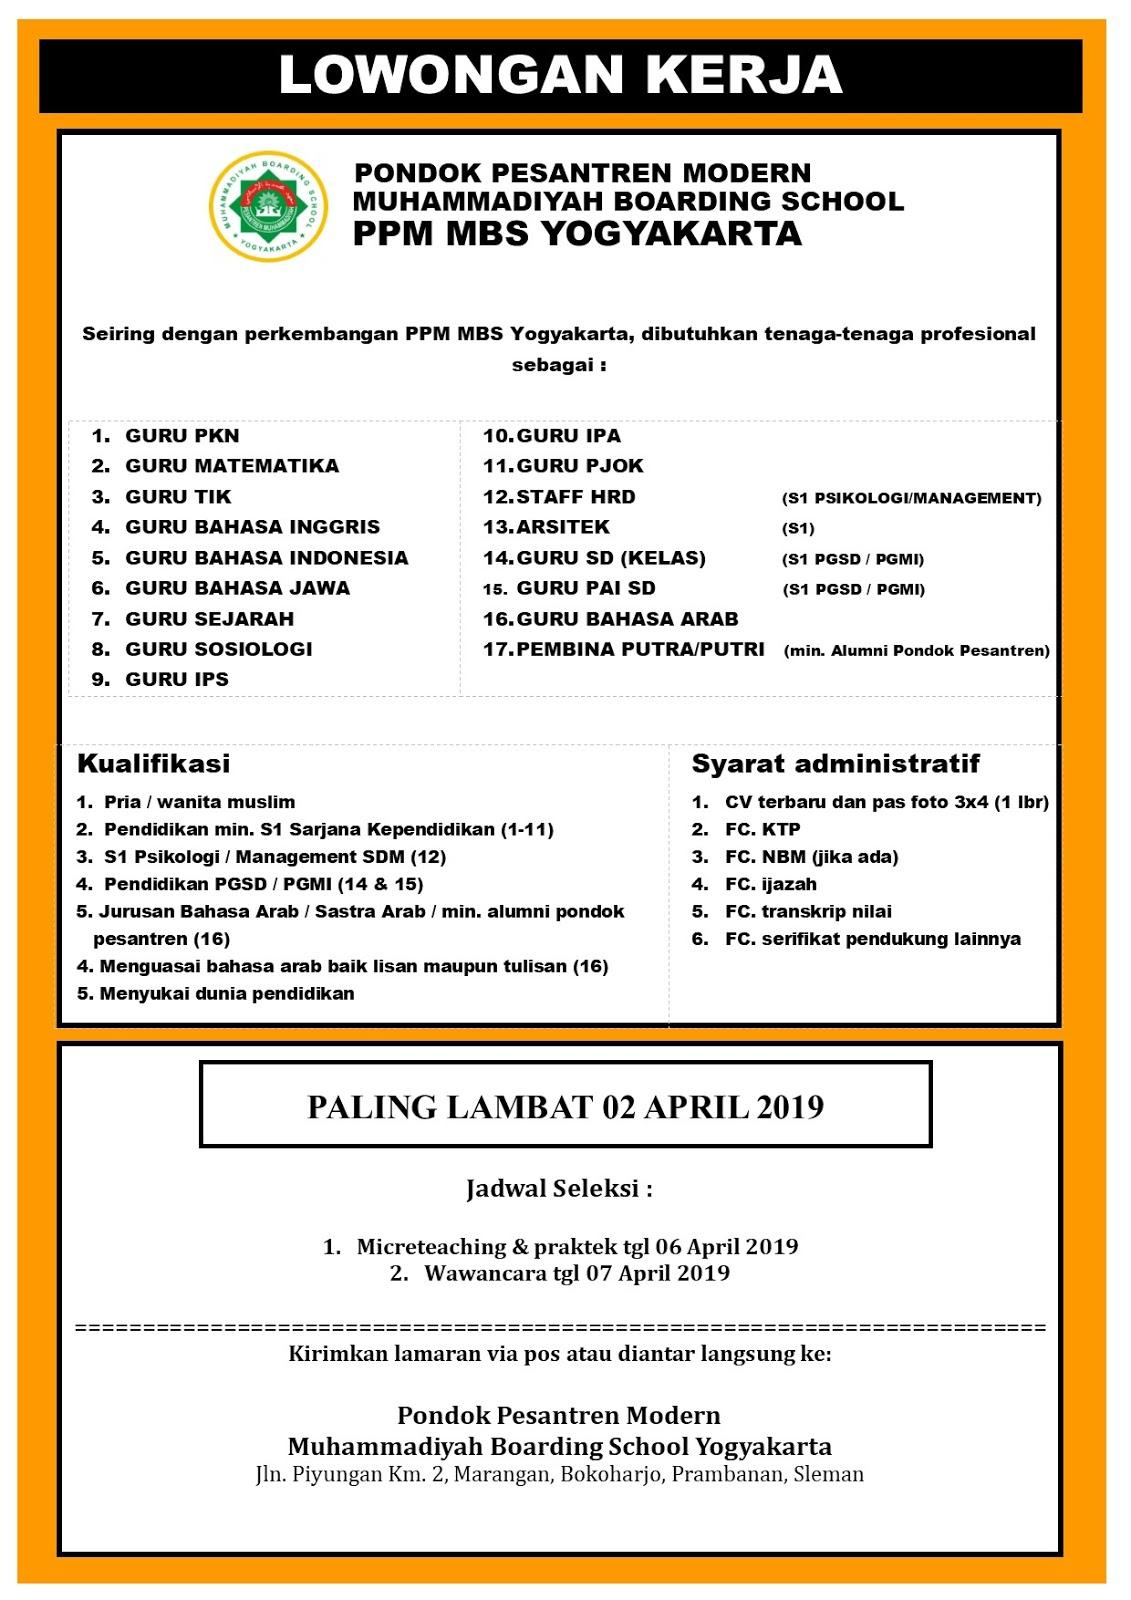 Lowongan Kerja Guru Di Ppm Mbs Yogyakarta Maret 2019 Loker Swasta